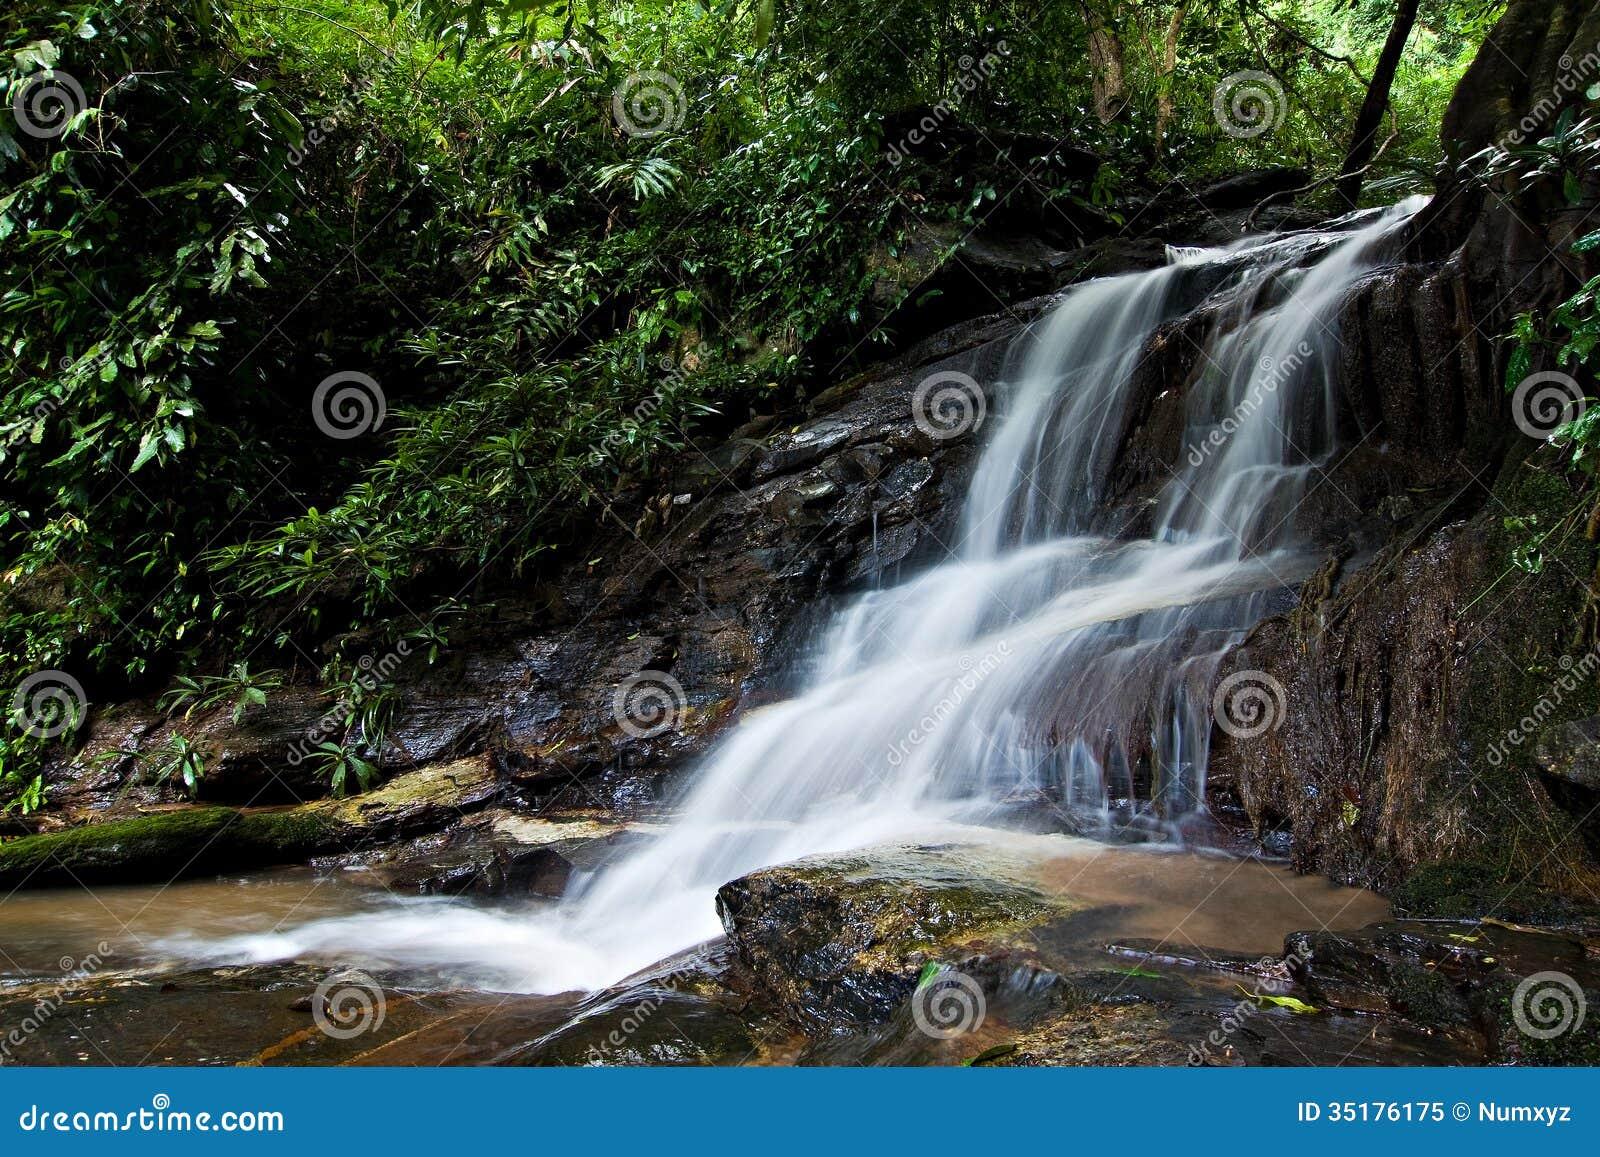 Small Waterfall Royalty Free Stock Photo Image 35176175